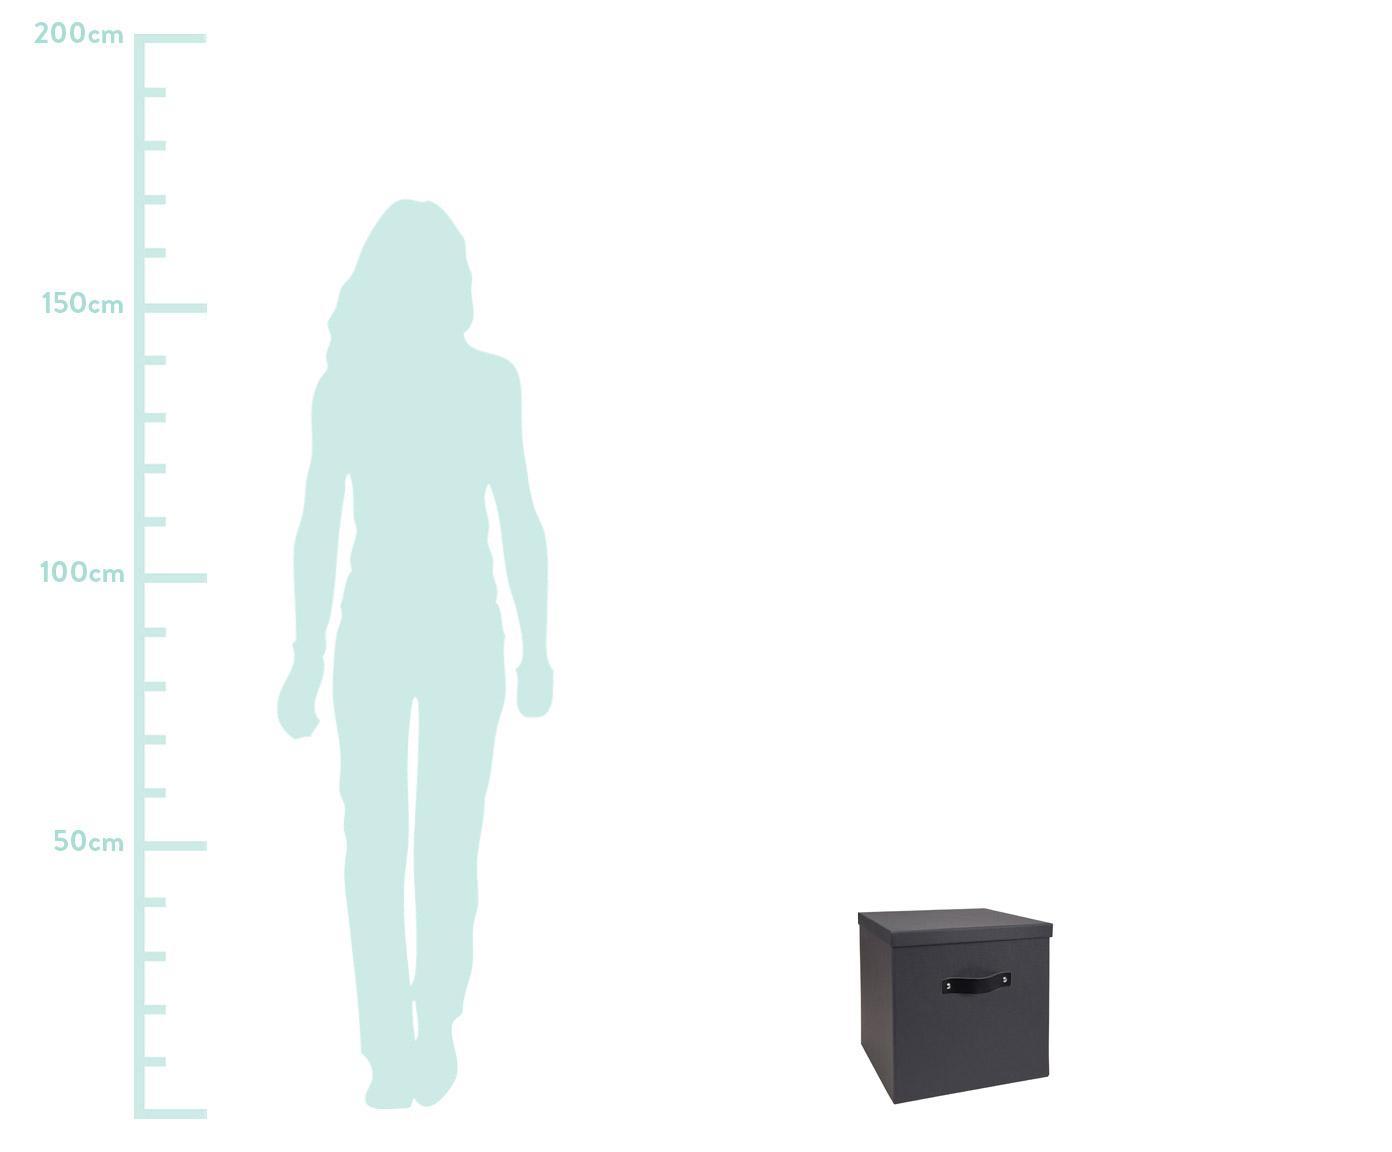 Aufbewahrungsbox Texas, Box: Fester, laminierter Karto, Griff: Leder, Dunkelgrau, 32 x 32 cm